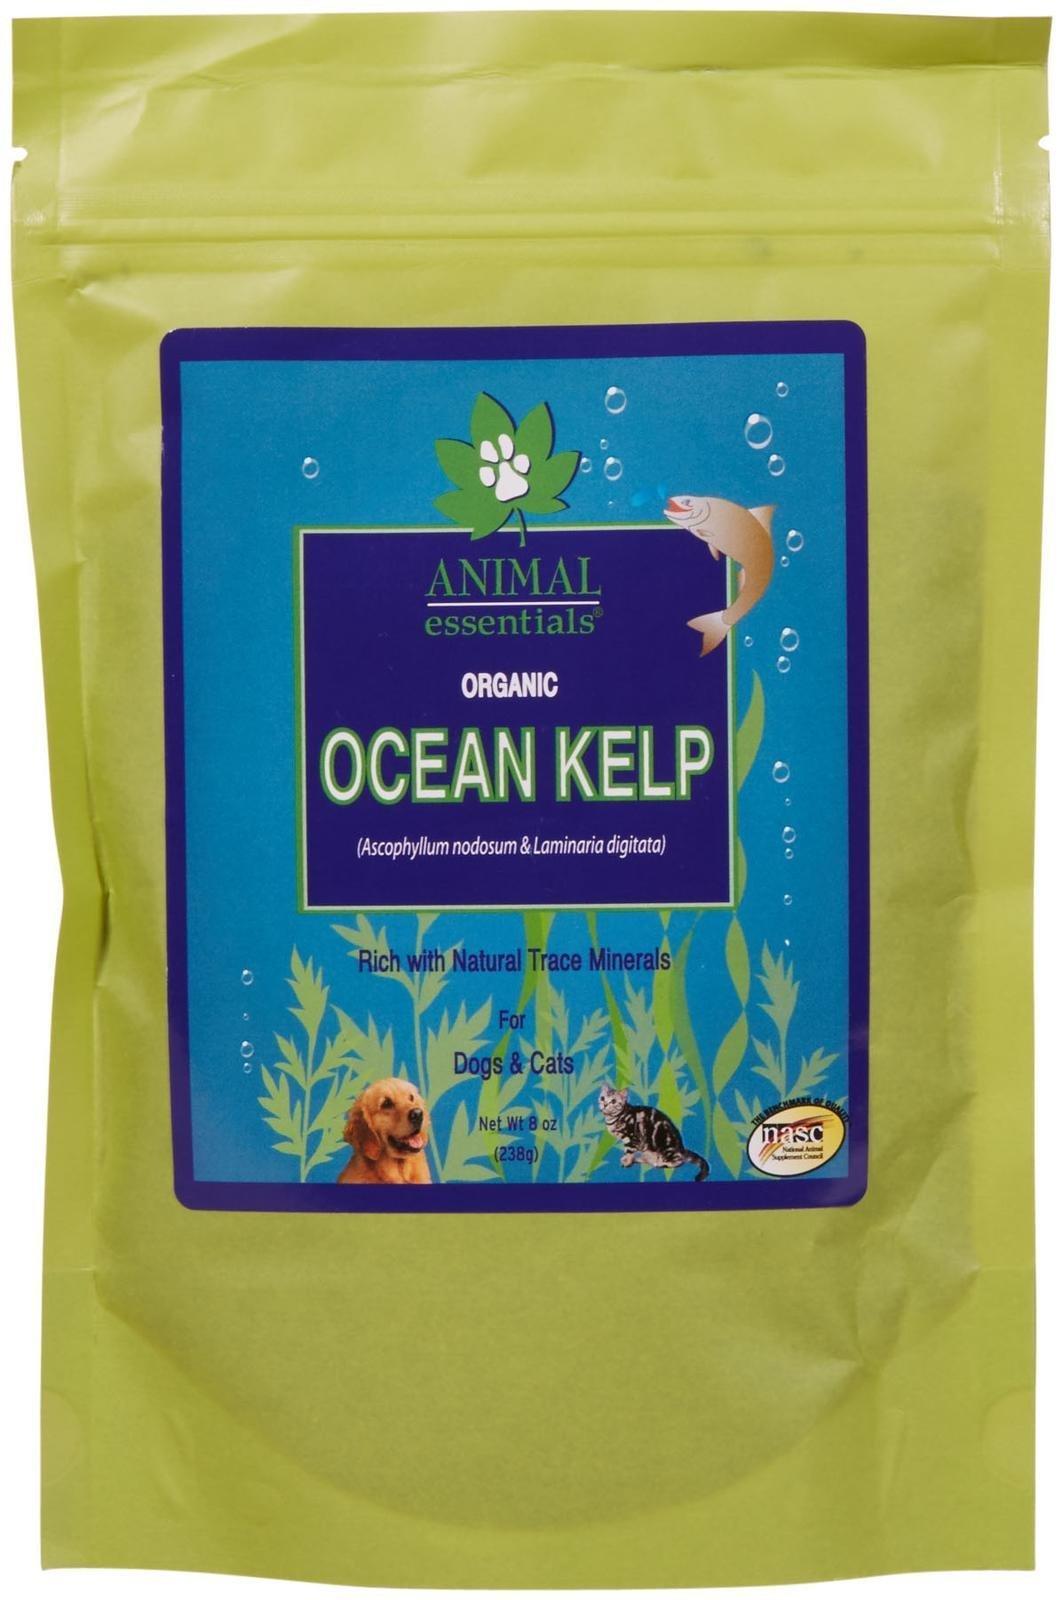 Animal Essentials Organic Ocean Kelp - 8 oz